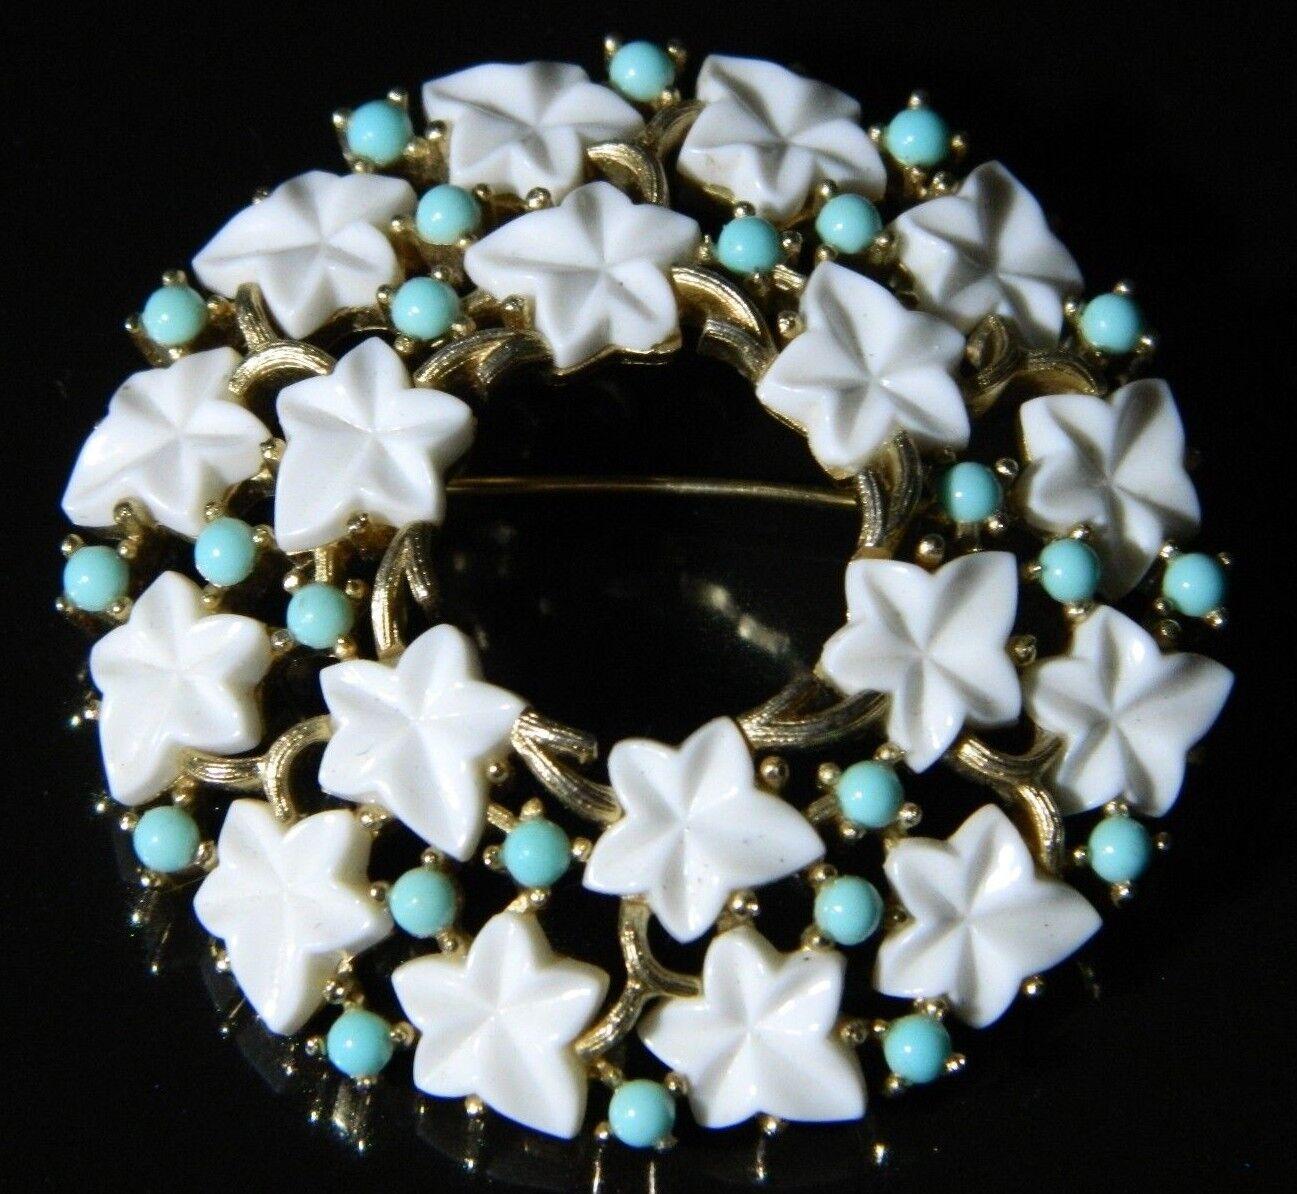 CROWN TRIFARI gold Tone bluee Cabochon White Lucite Leaf Flower Pin Brooch